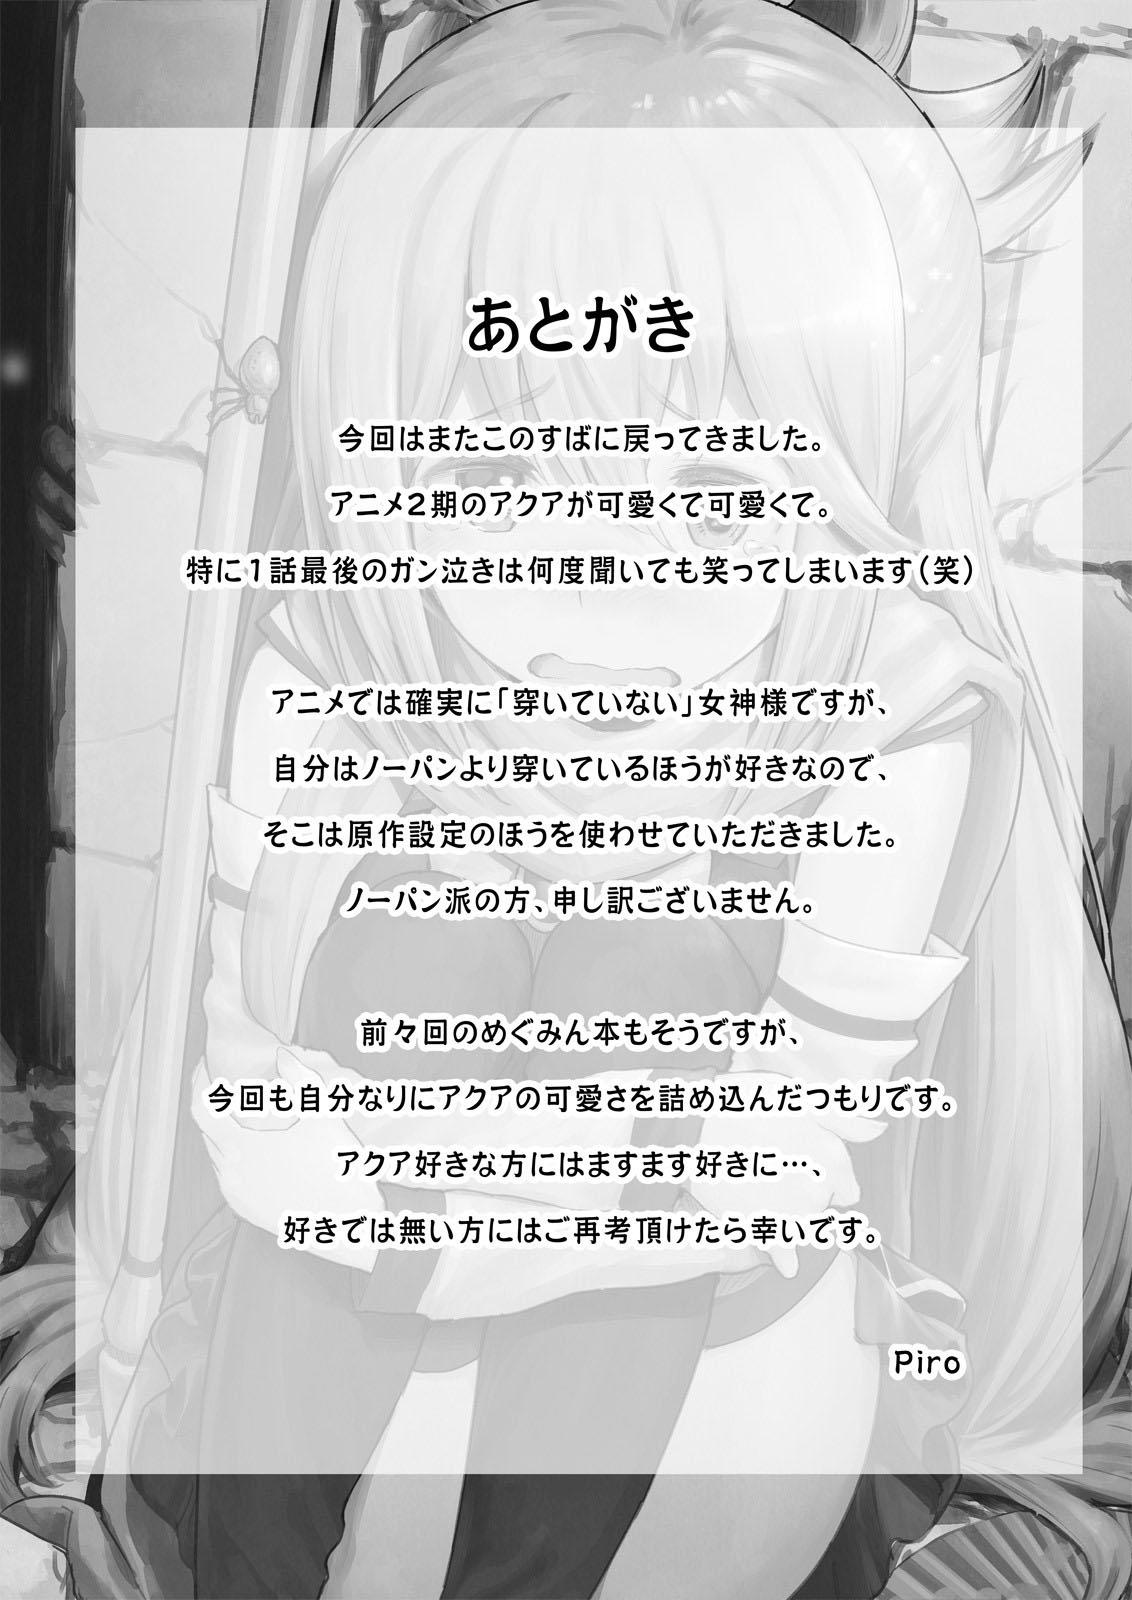 DAMEGAMI-sama wa Nomisugi ni Gochuui O!